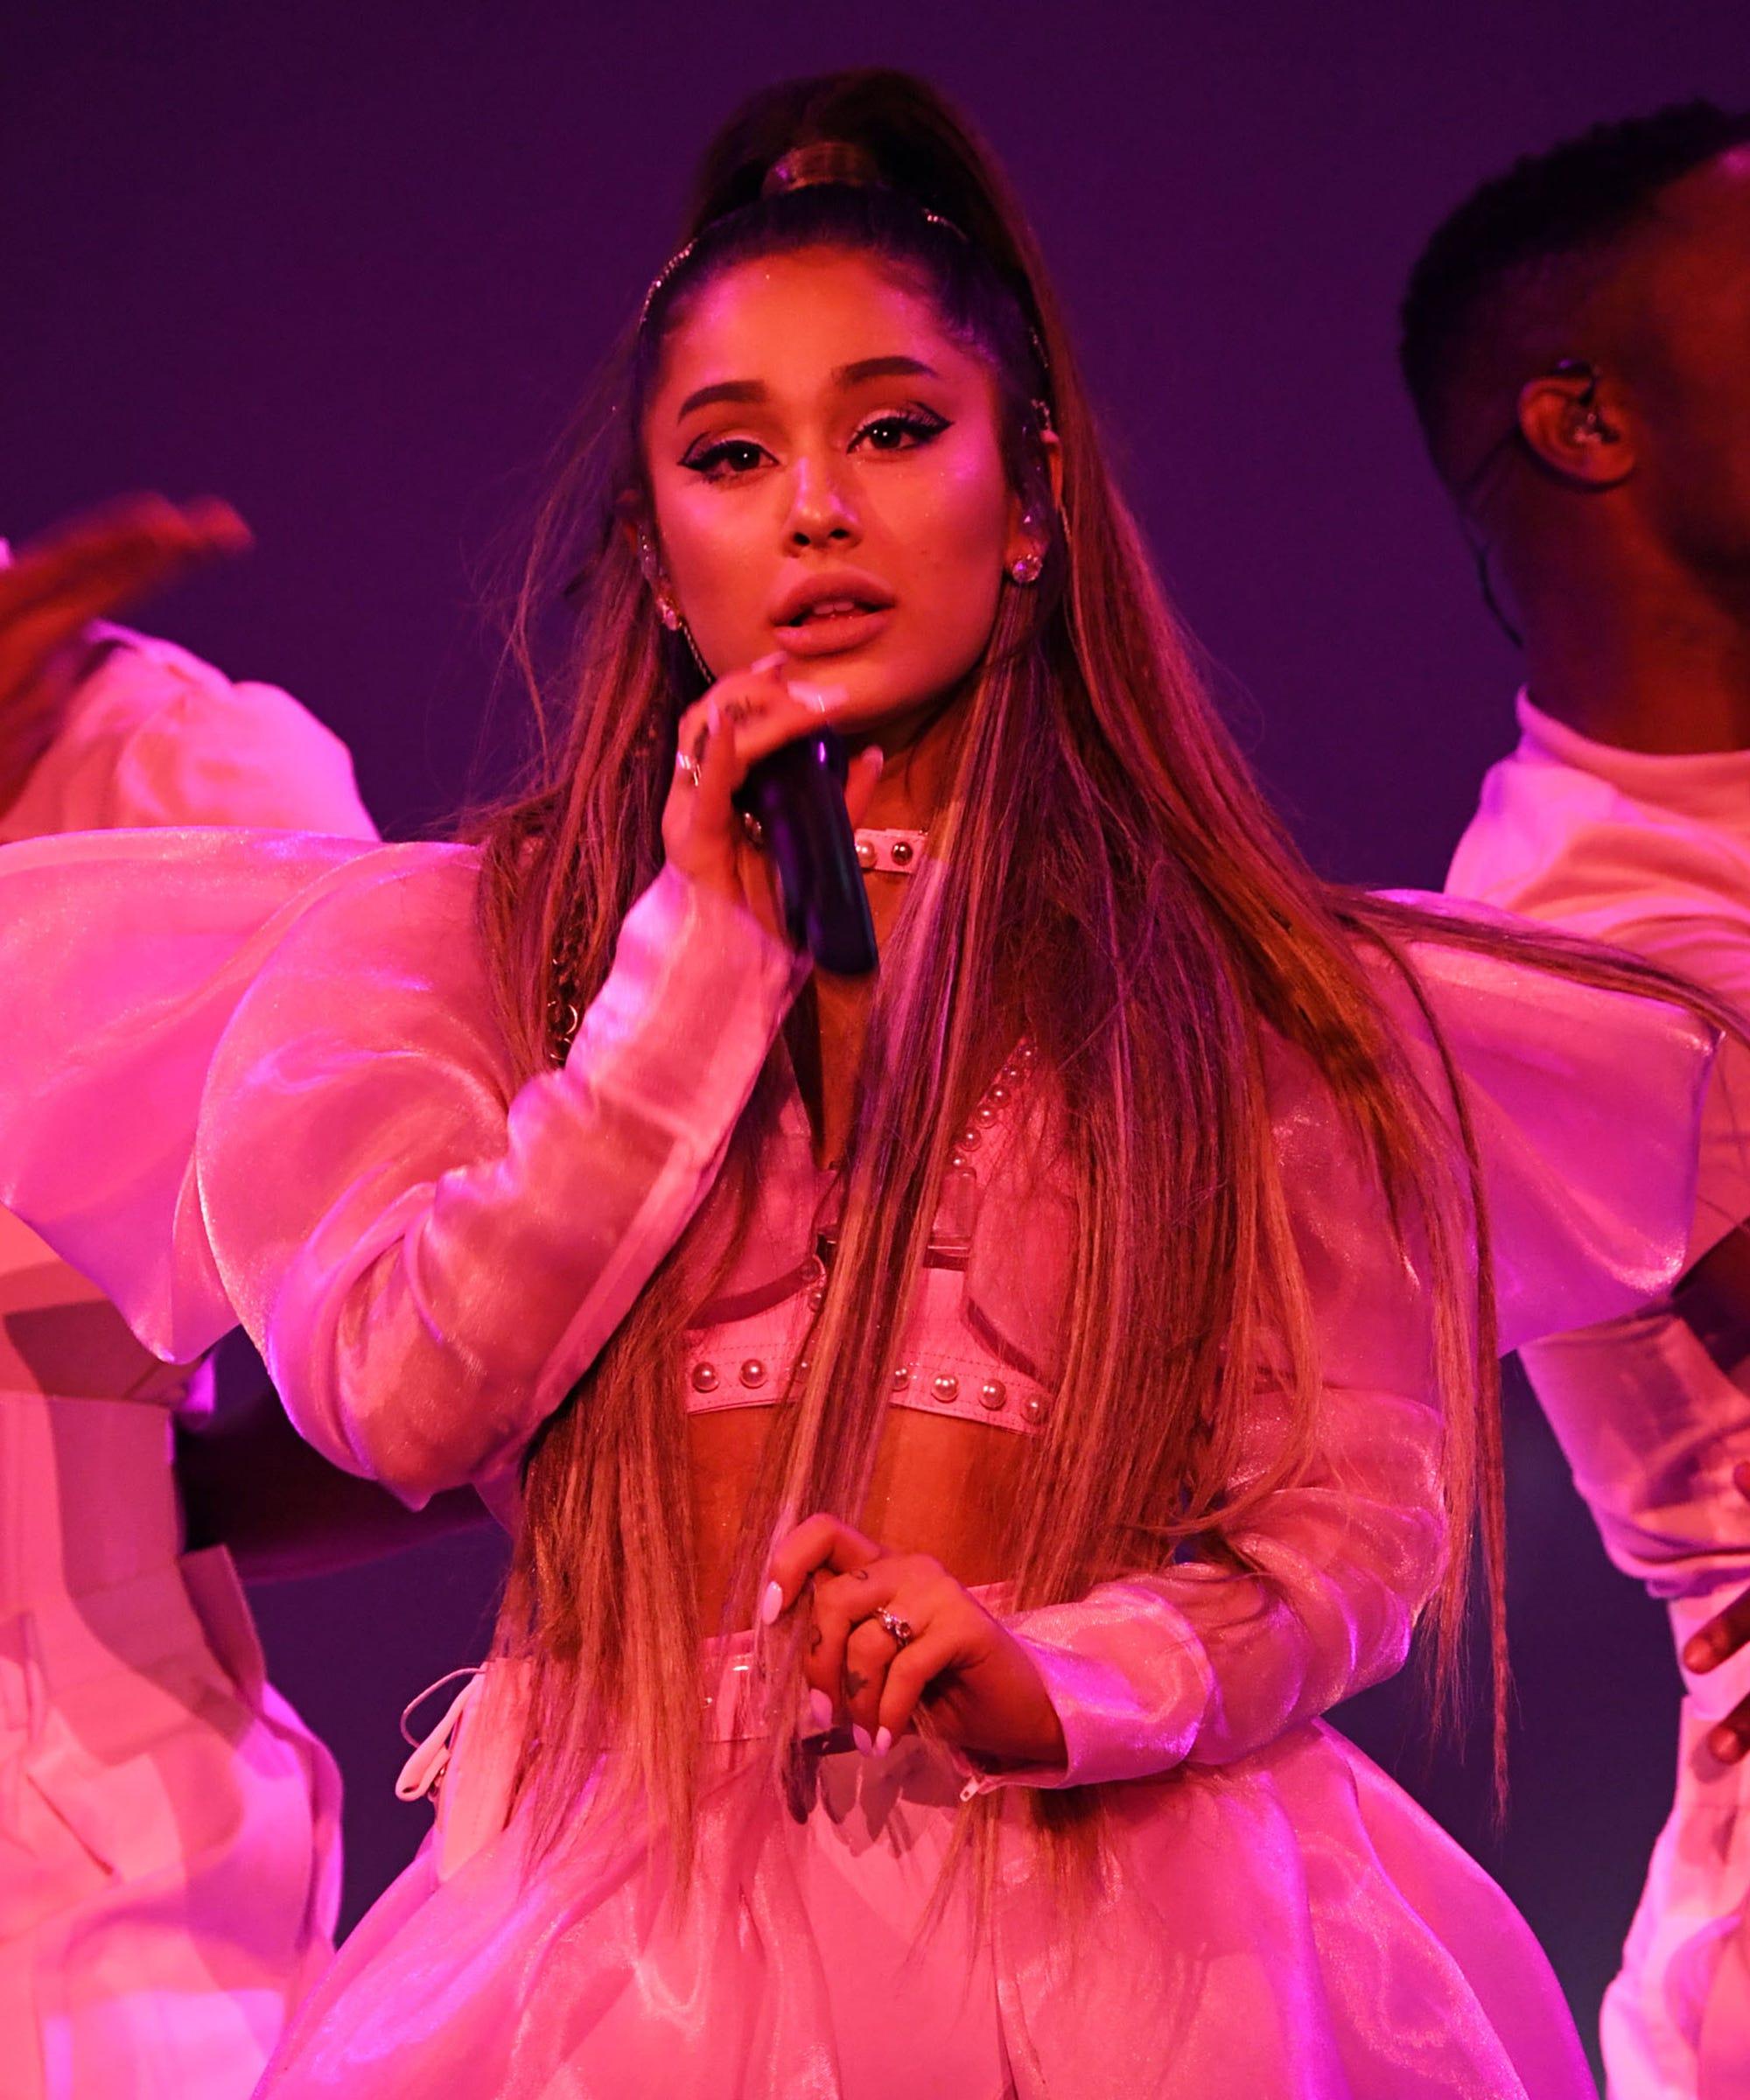 Ariana Grande 2 Chainz Surprise Sweetener Tour Diary